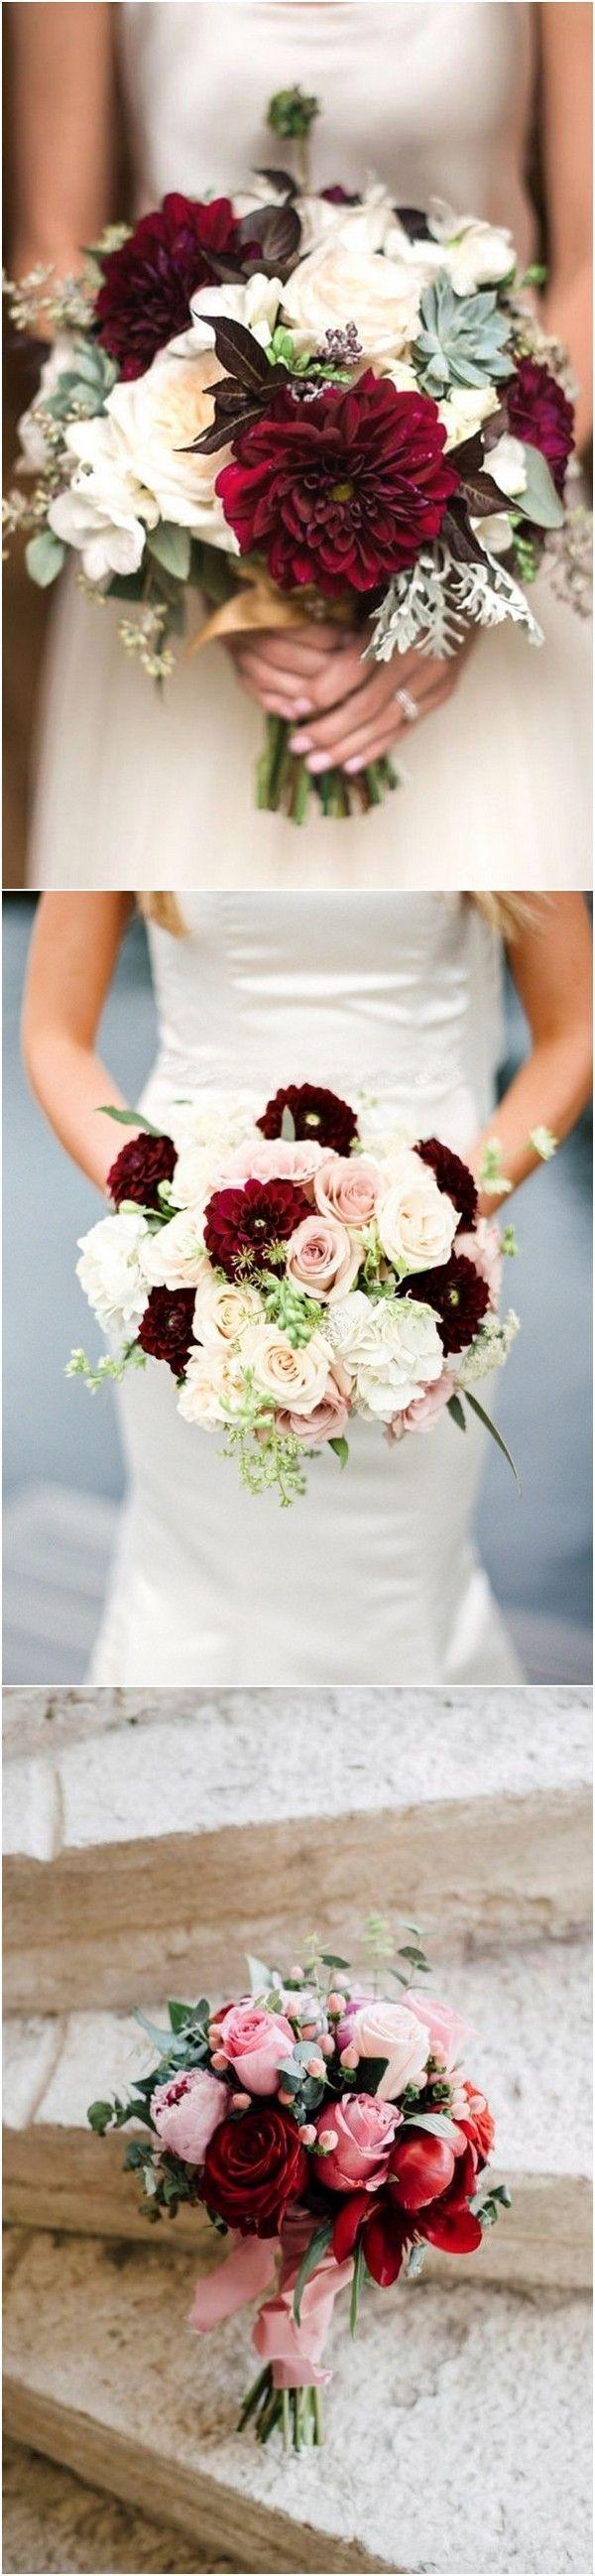 burgundy and blush wedding bouquet ideas   Wedding Flowers ...